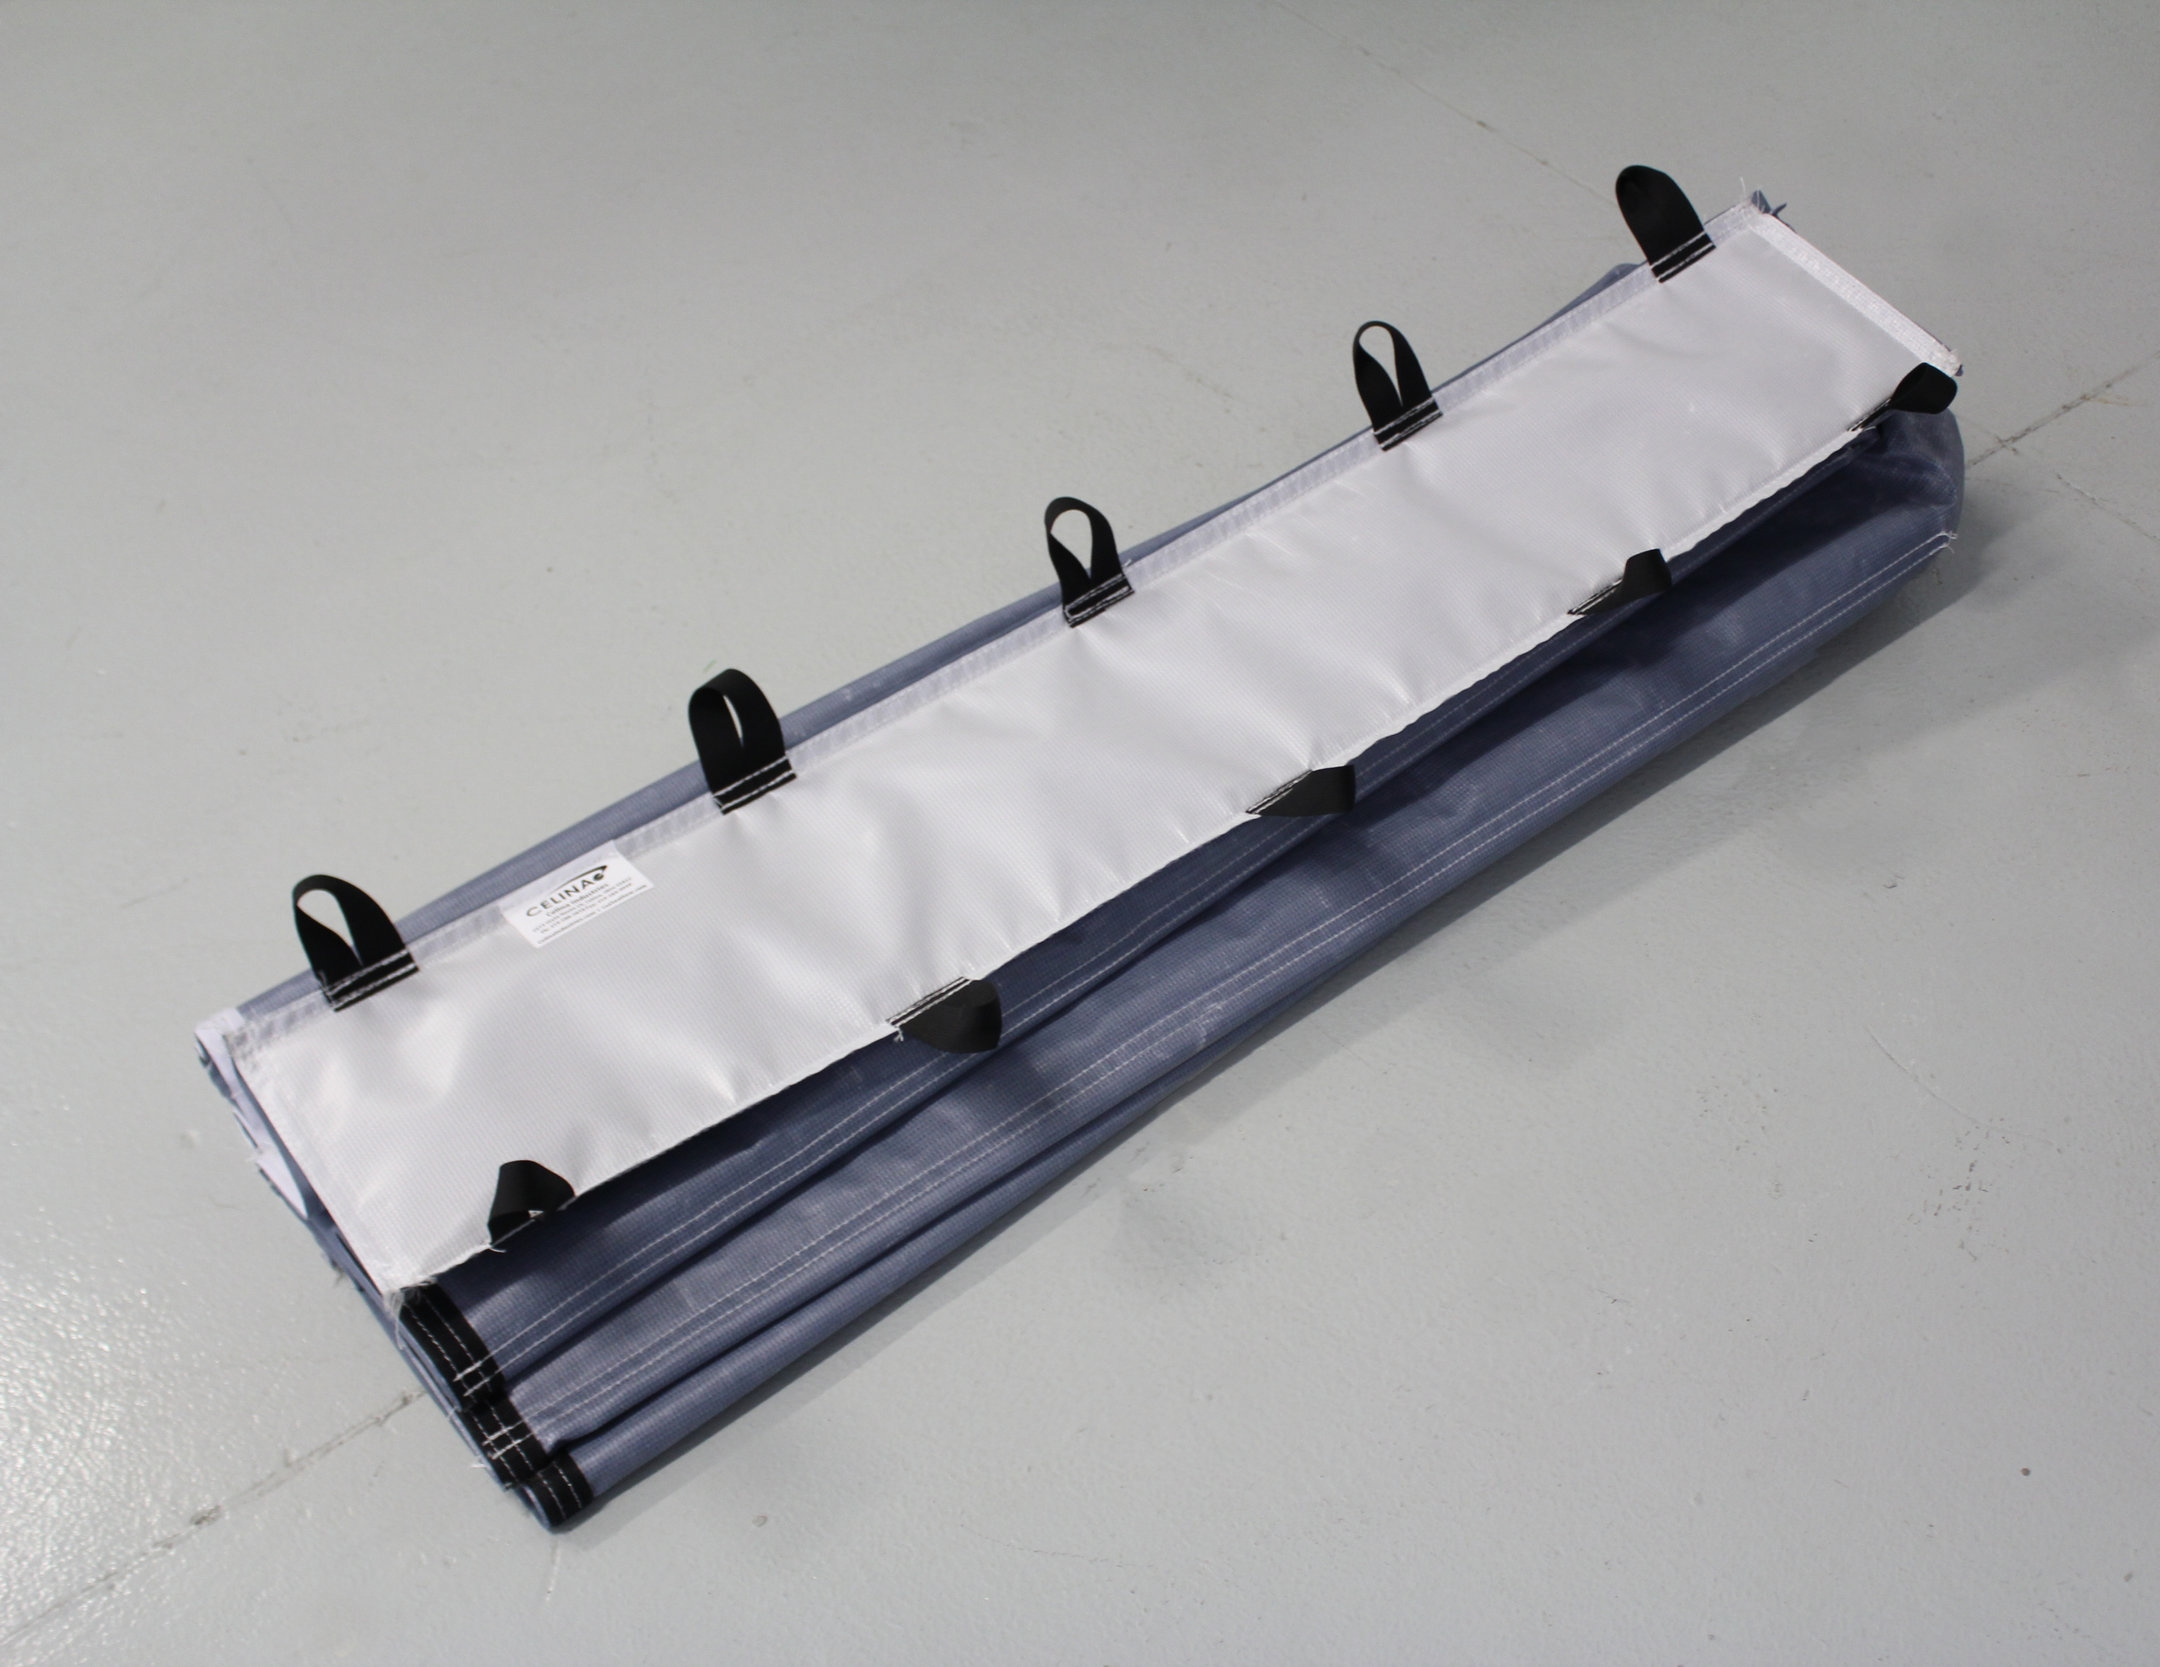 returnable-fabric-packaging-system-rack-095.JPG